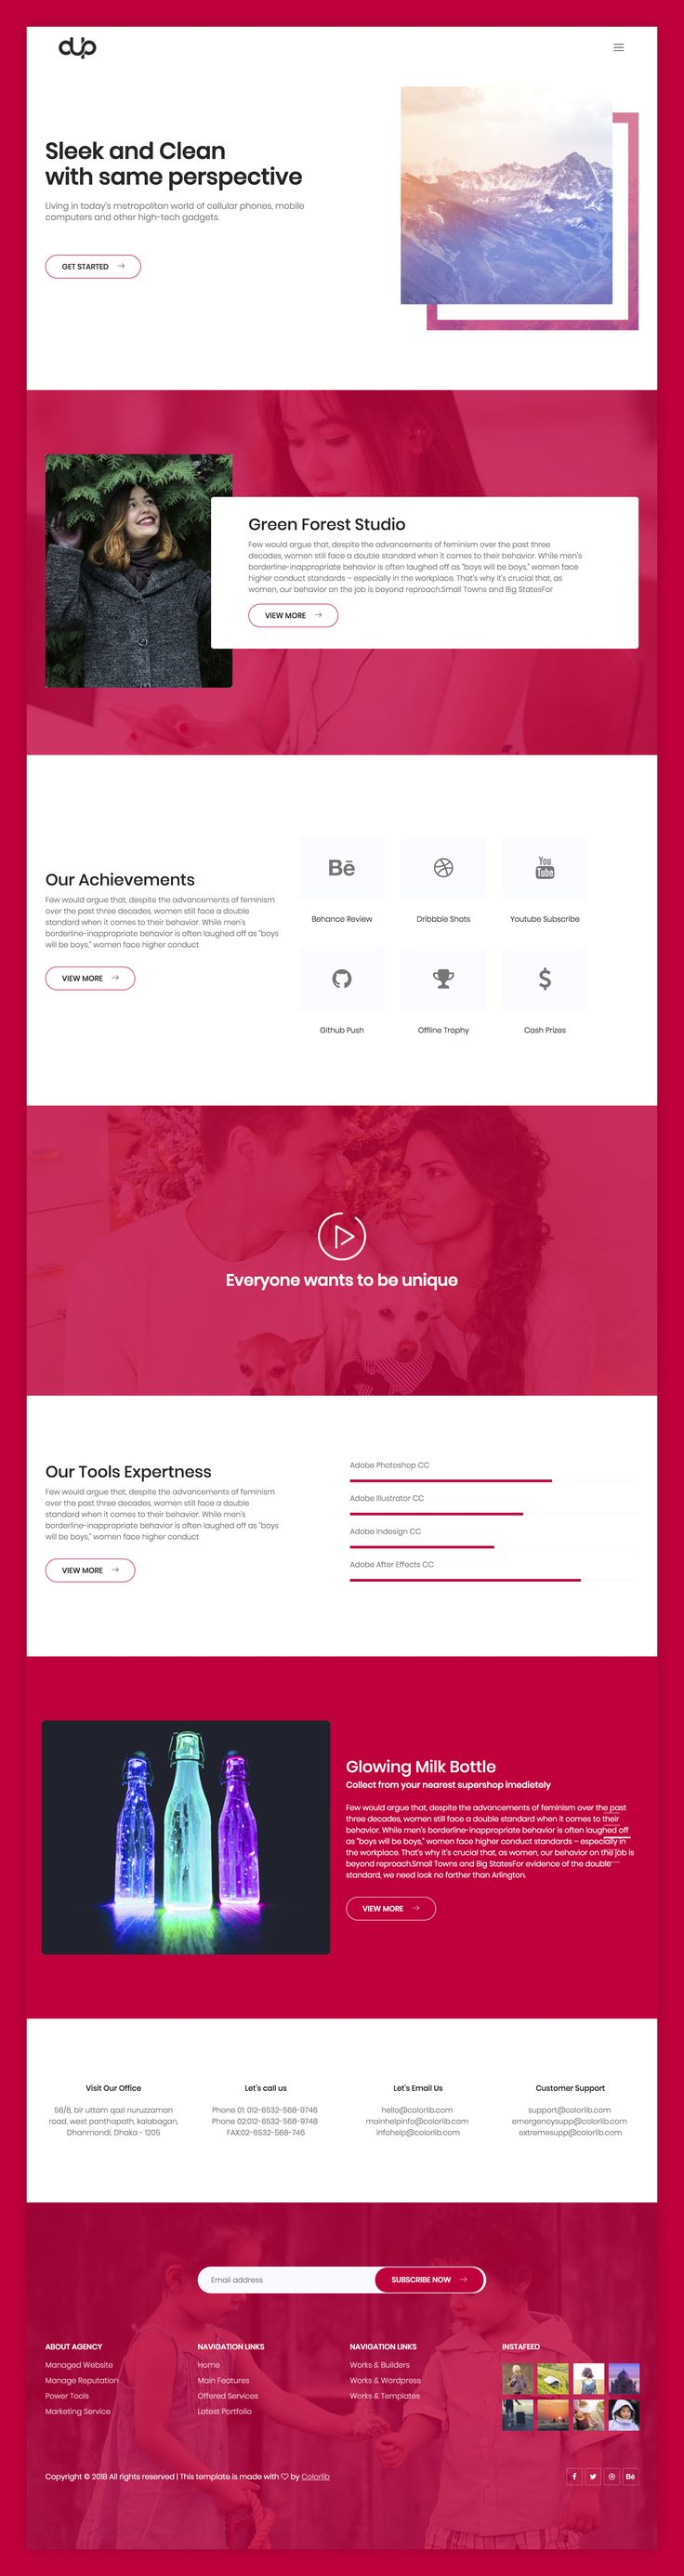 52 best UX Kits images on Pinterest | Desarrollo web, Brainstorm y ...